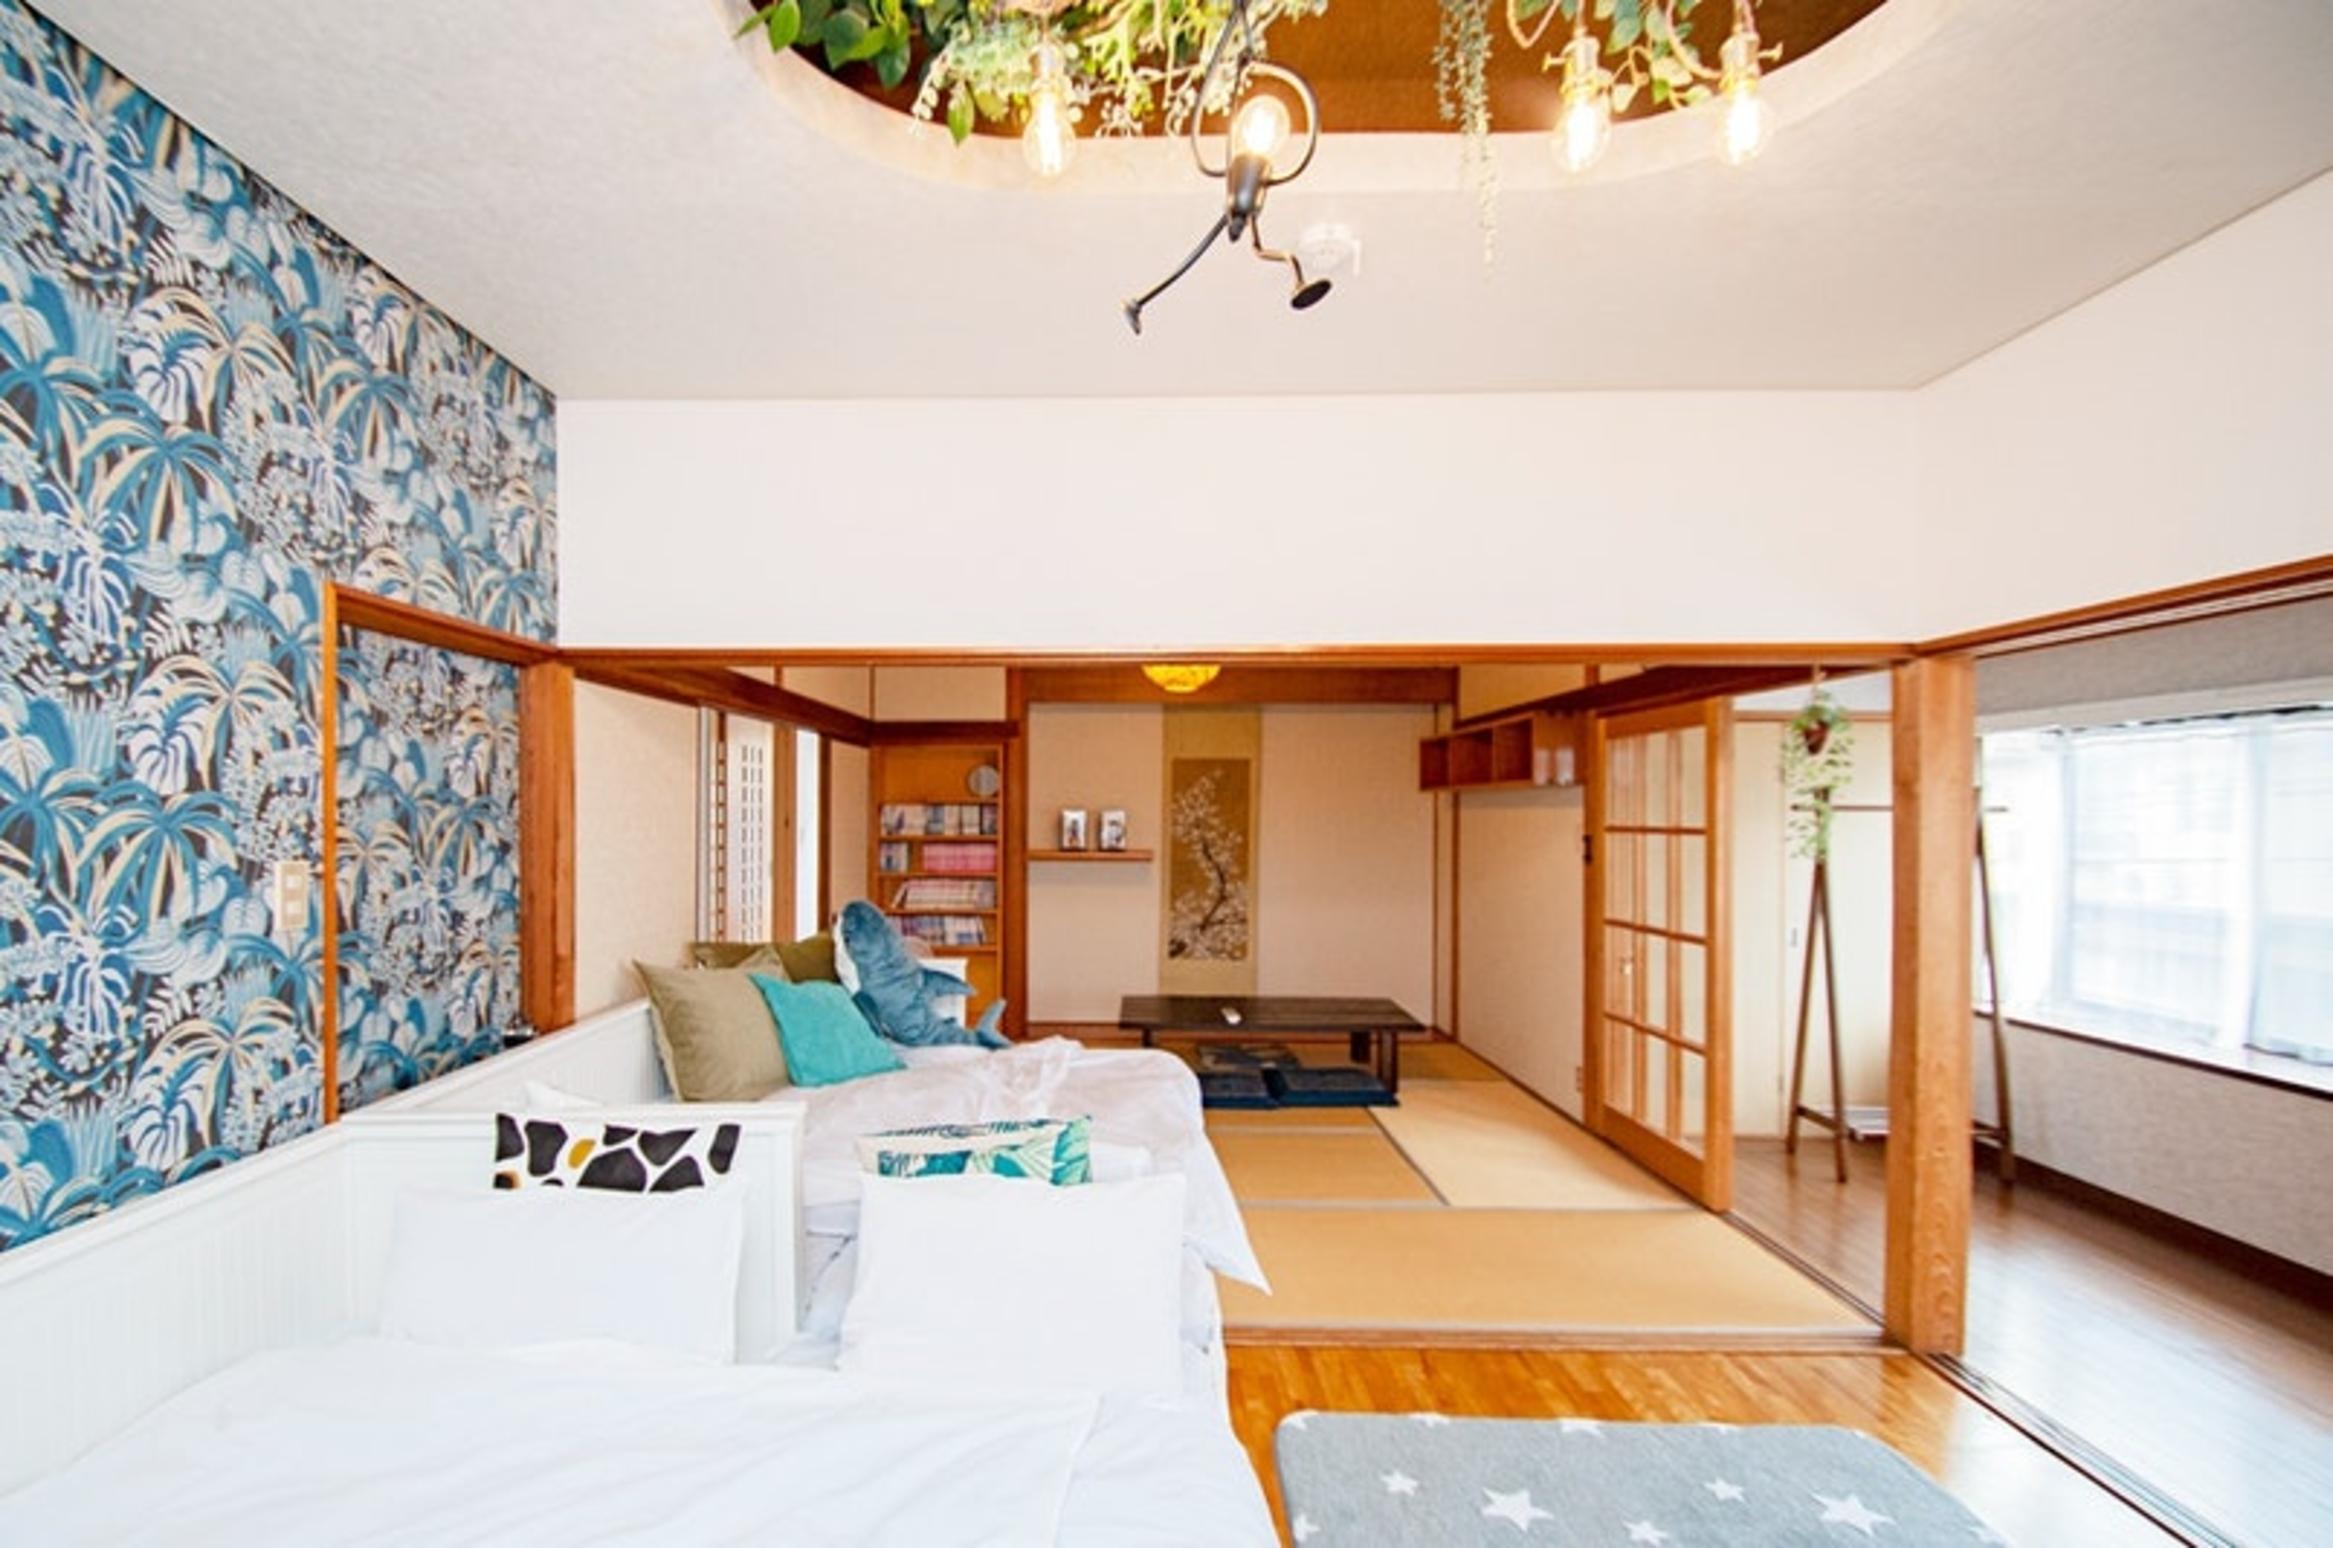 KASUMI-an 白山【Vacation STAY提供】の写真